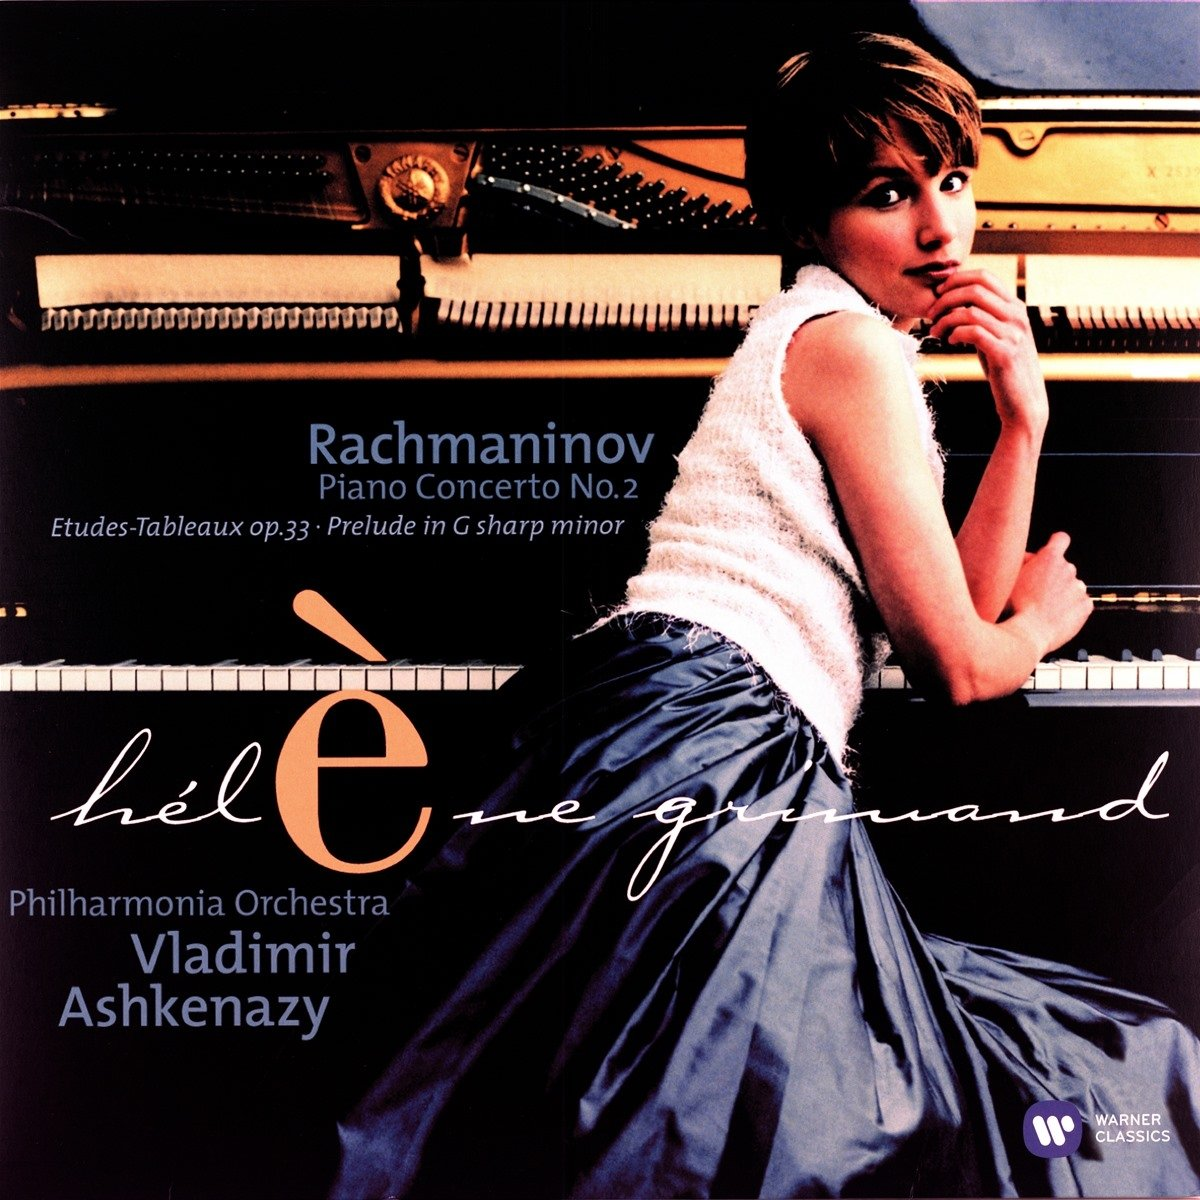 Vinilo : Helene Grimaud - Rachmaninov: Piano Concerto No. 2 (LP Vinyl)